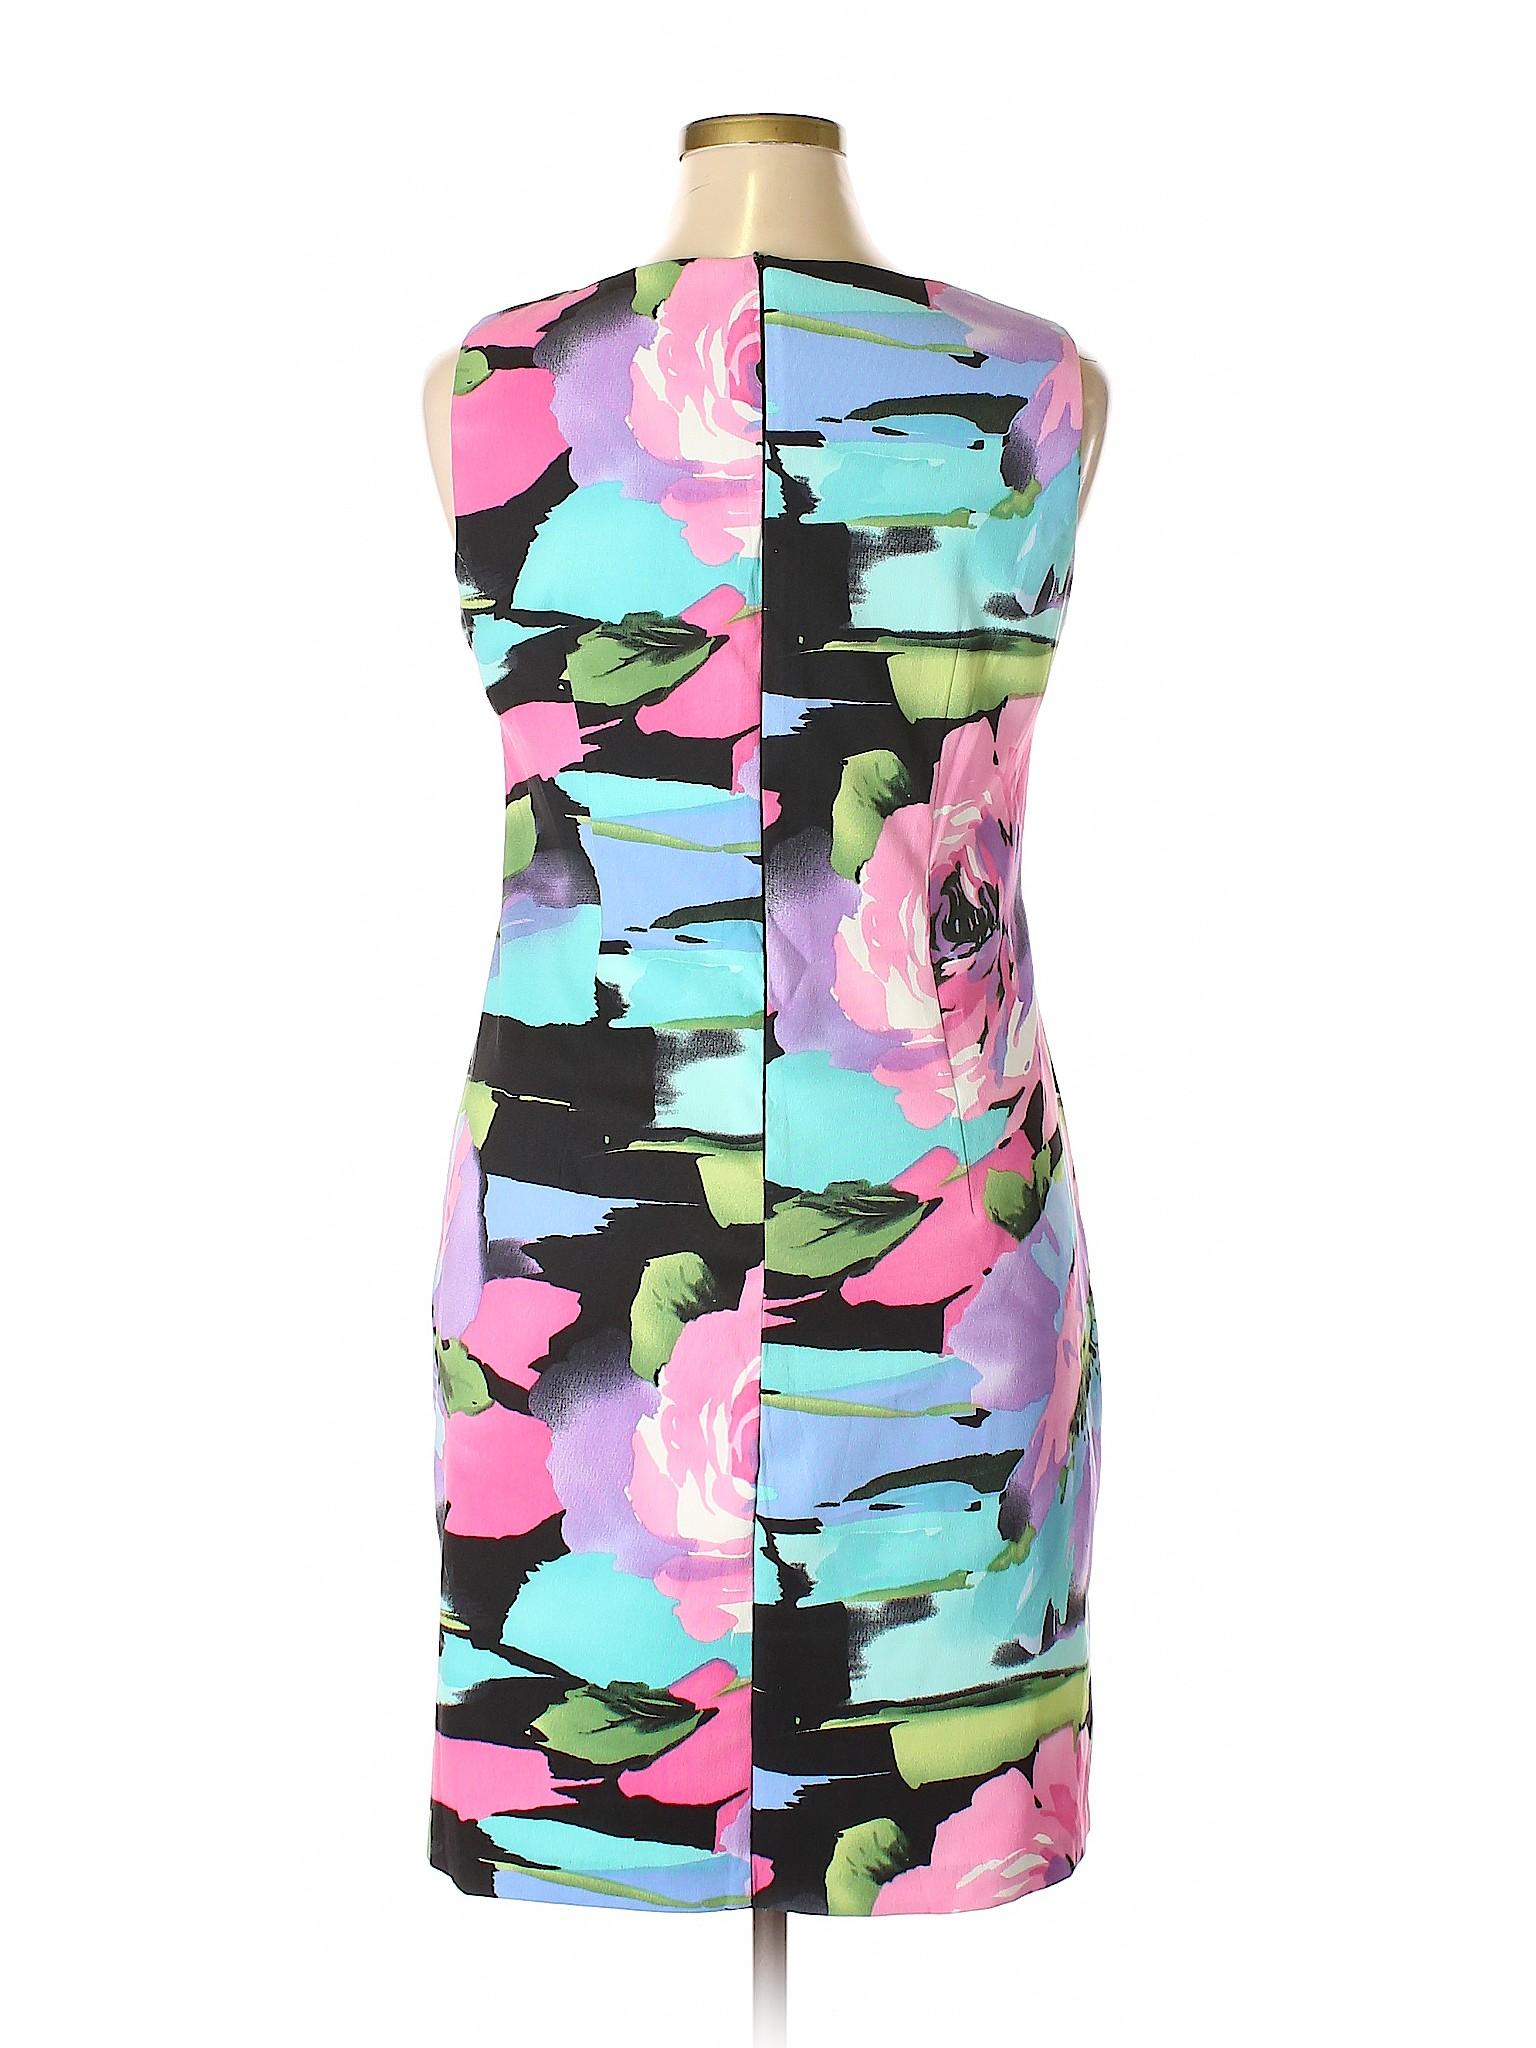 Casual Apparel winter Dress Connected Boutique qw1TXftn